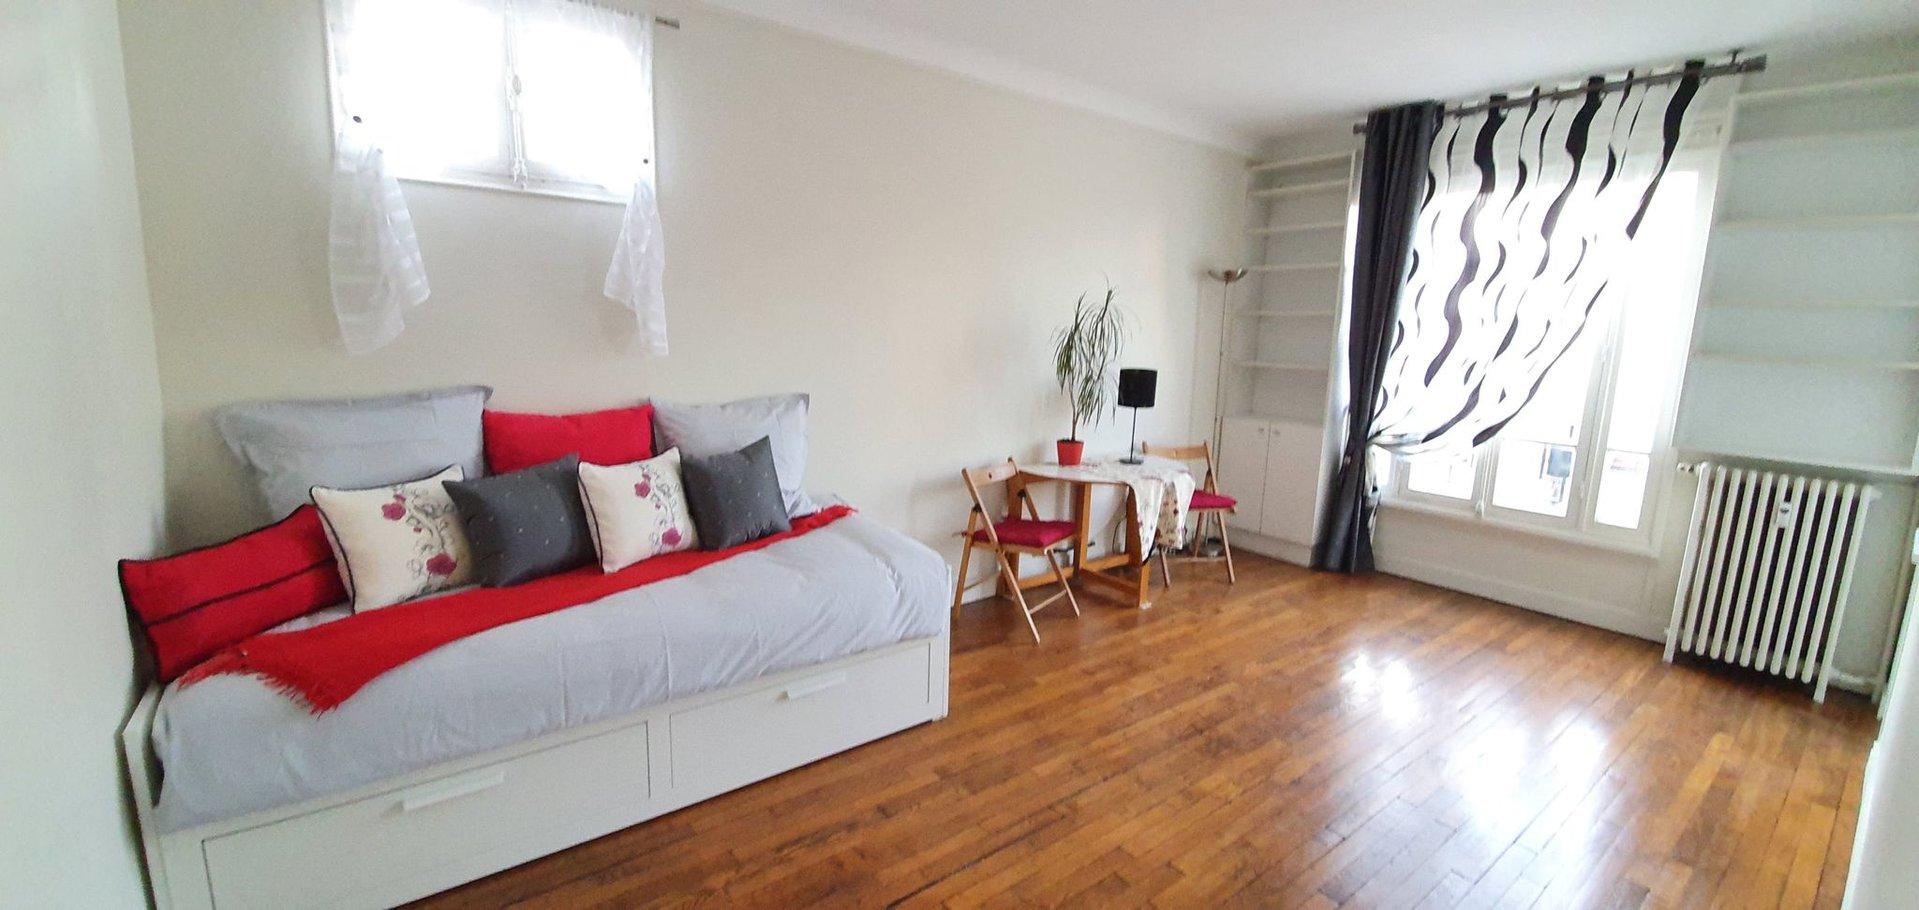 Alquiler Piso - Boulogne-Billancourt